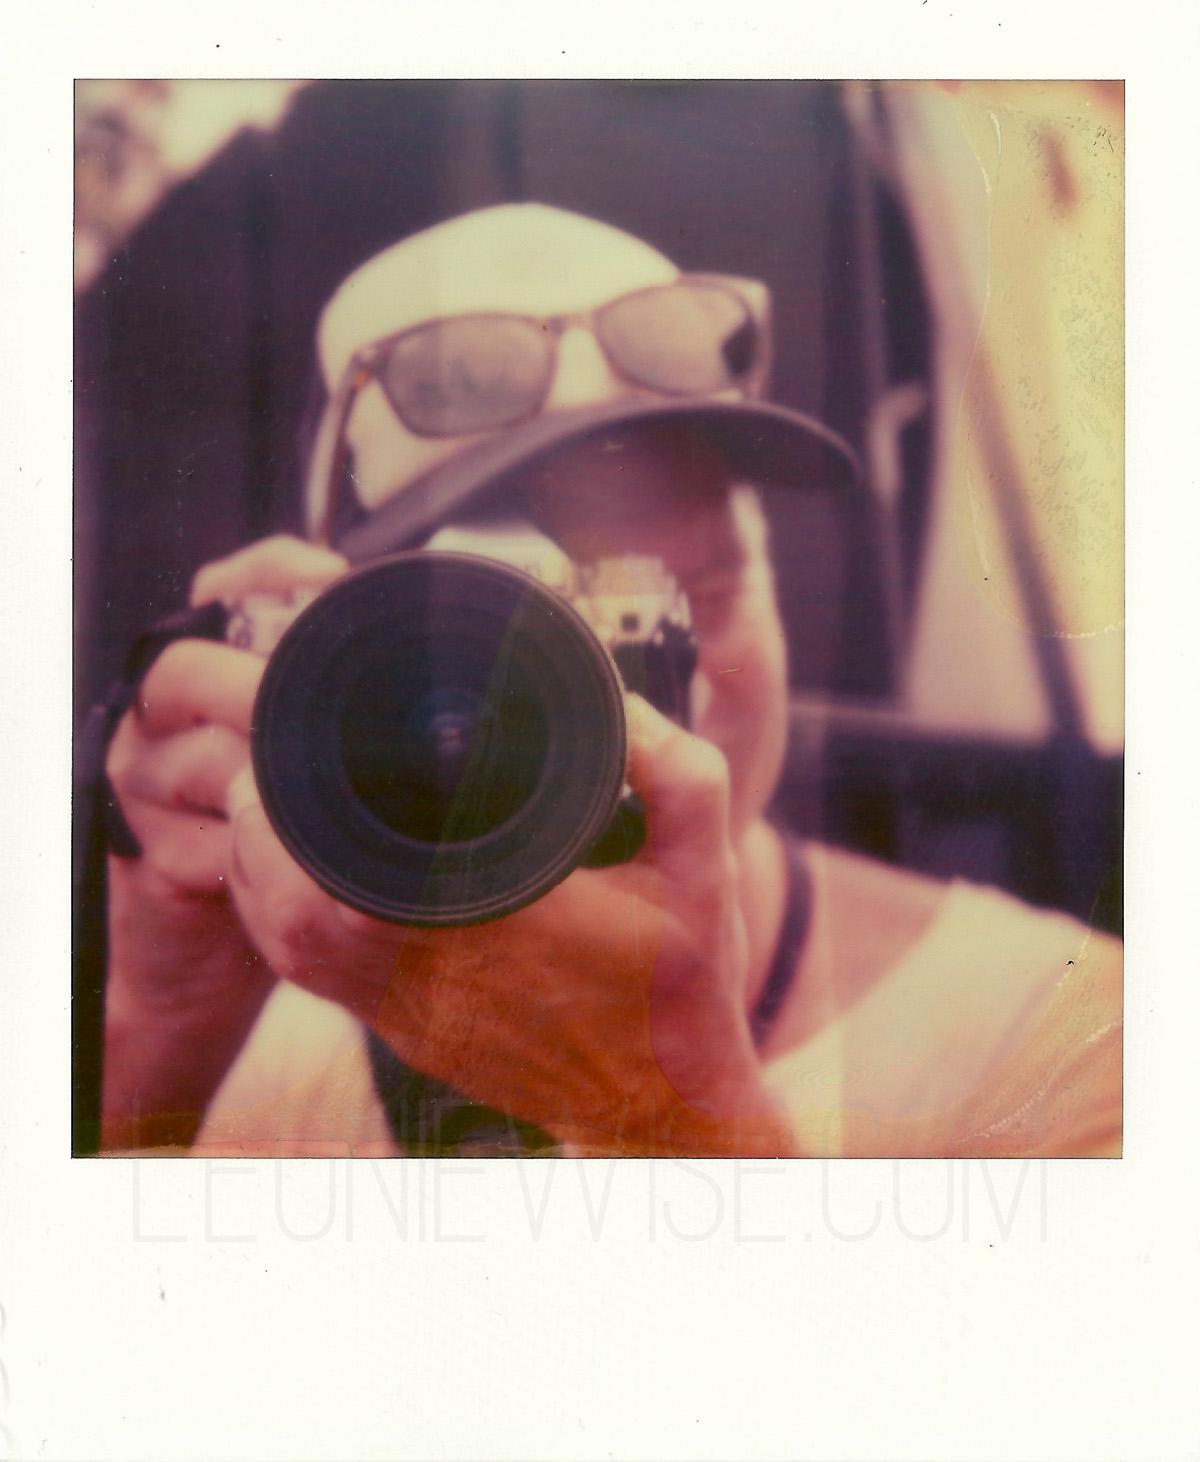 MusicAtMatua_Polaroid-SX70_Impossible-PX70_leoniewise-1